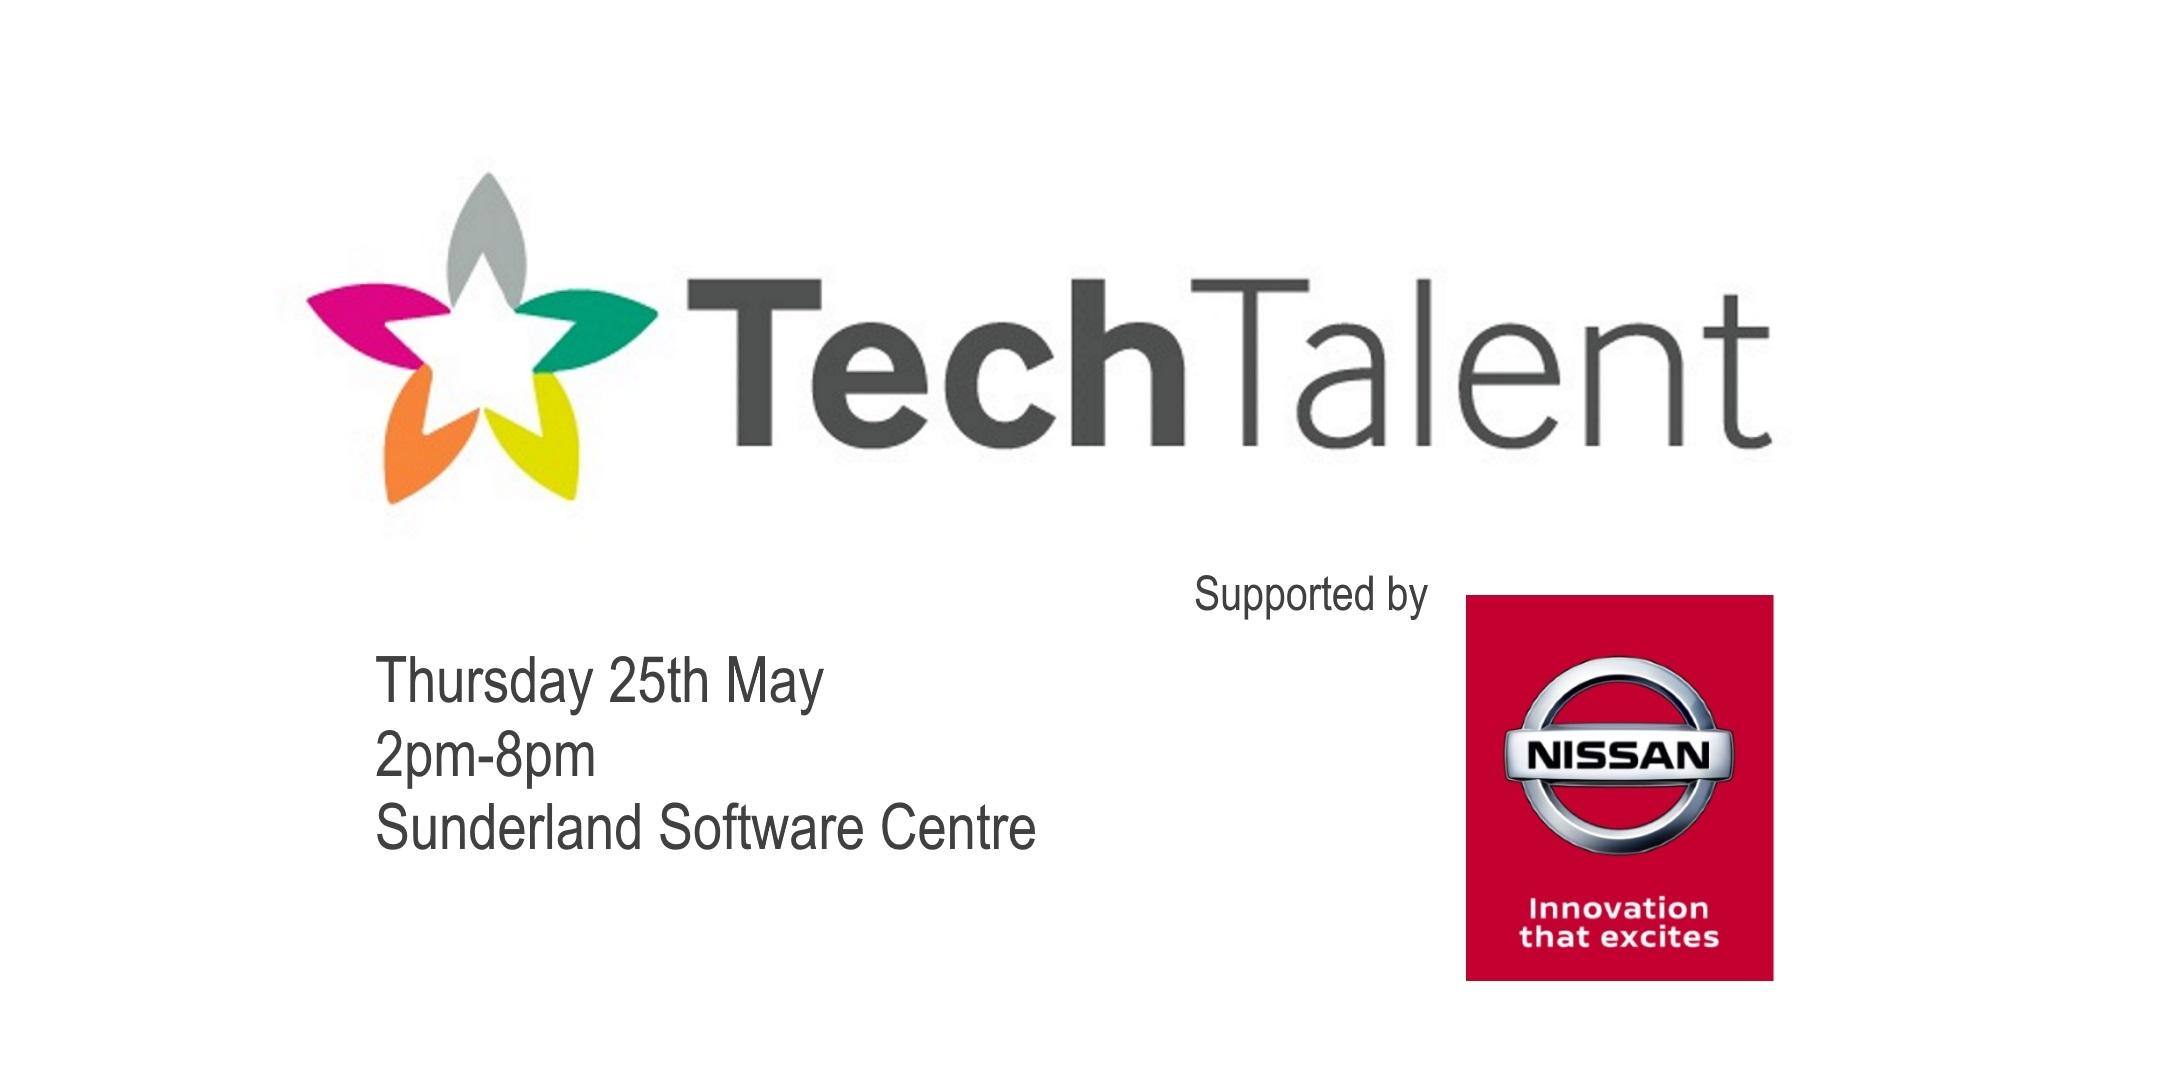 tech talent jobs and skills fair sunderland software centre  tech talent jobs and skills fair